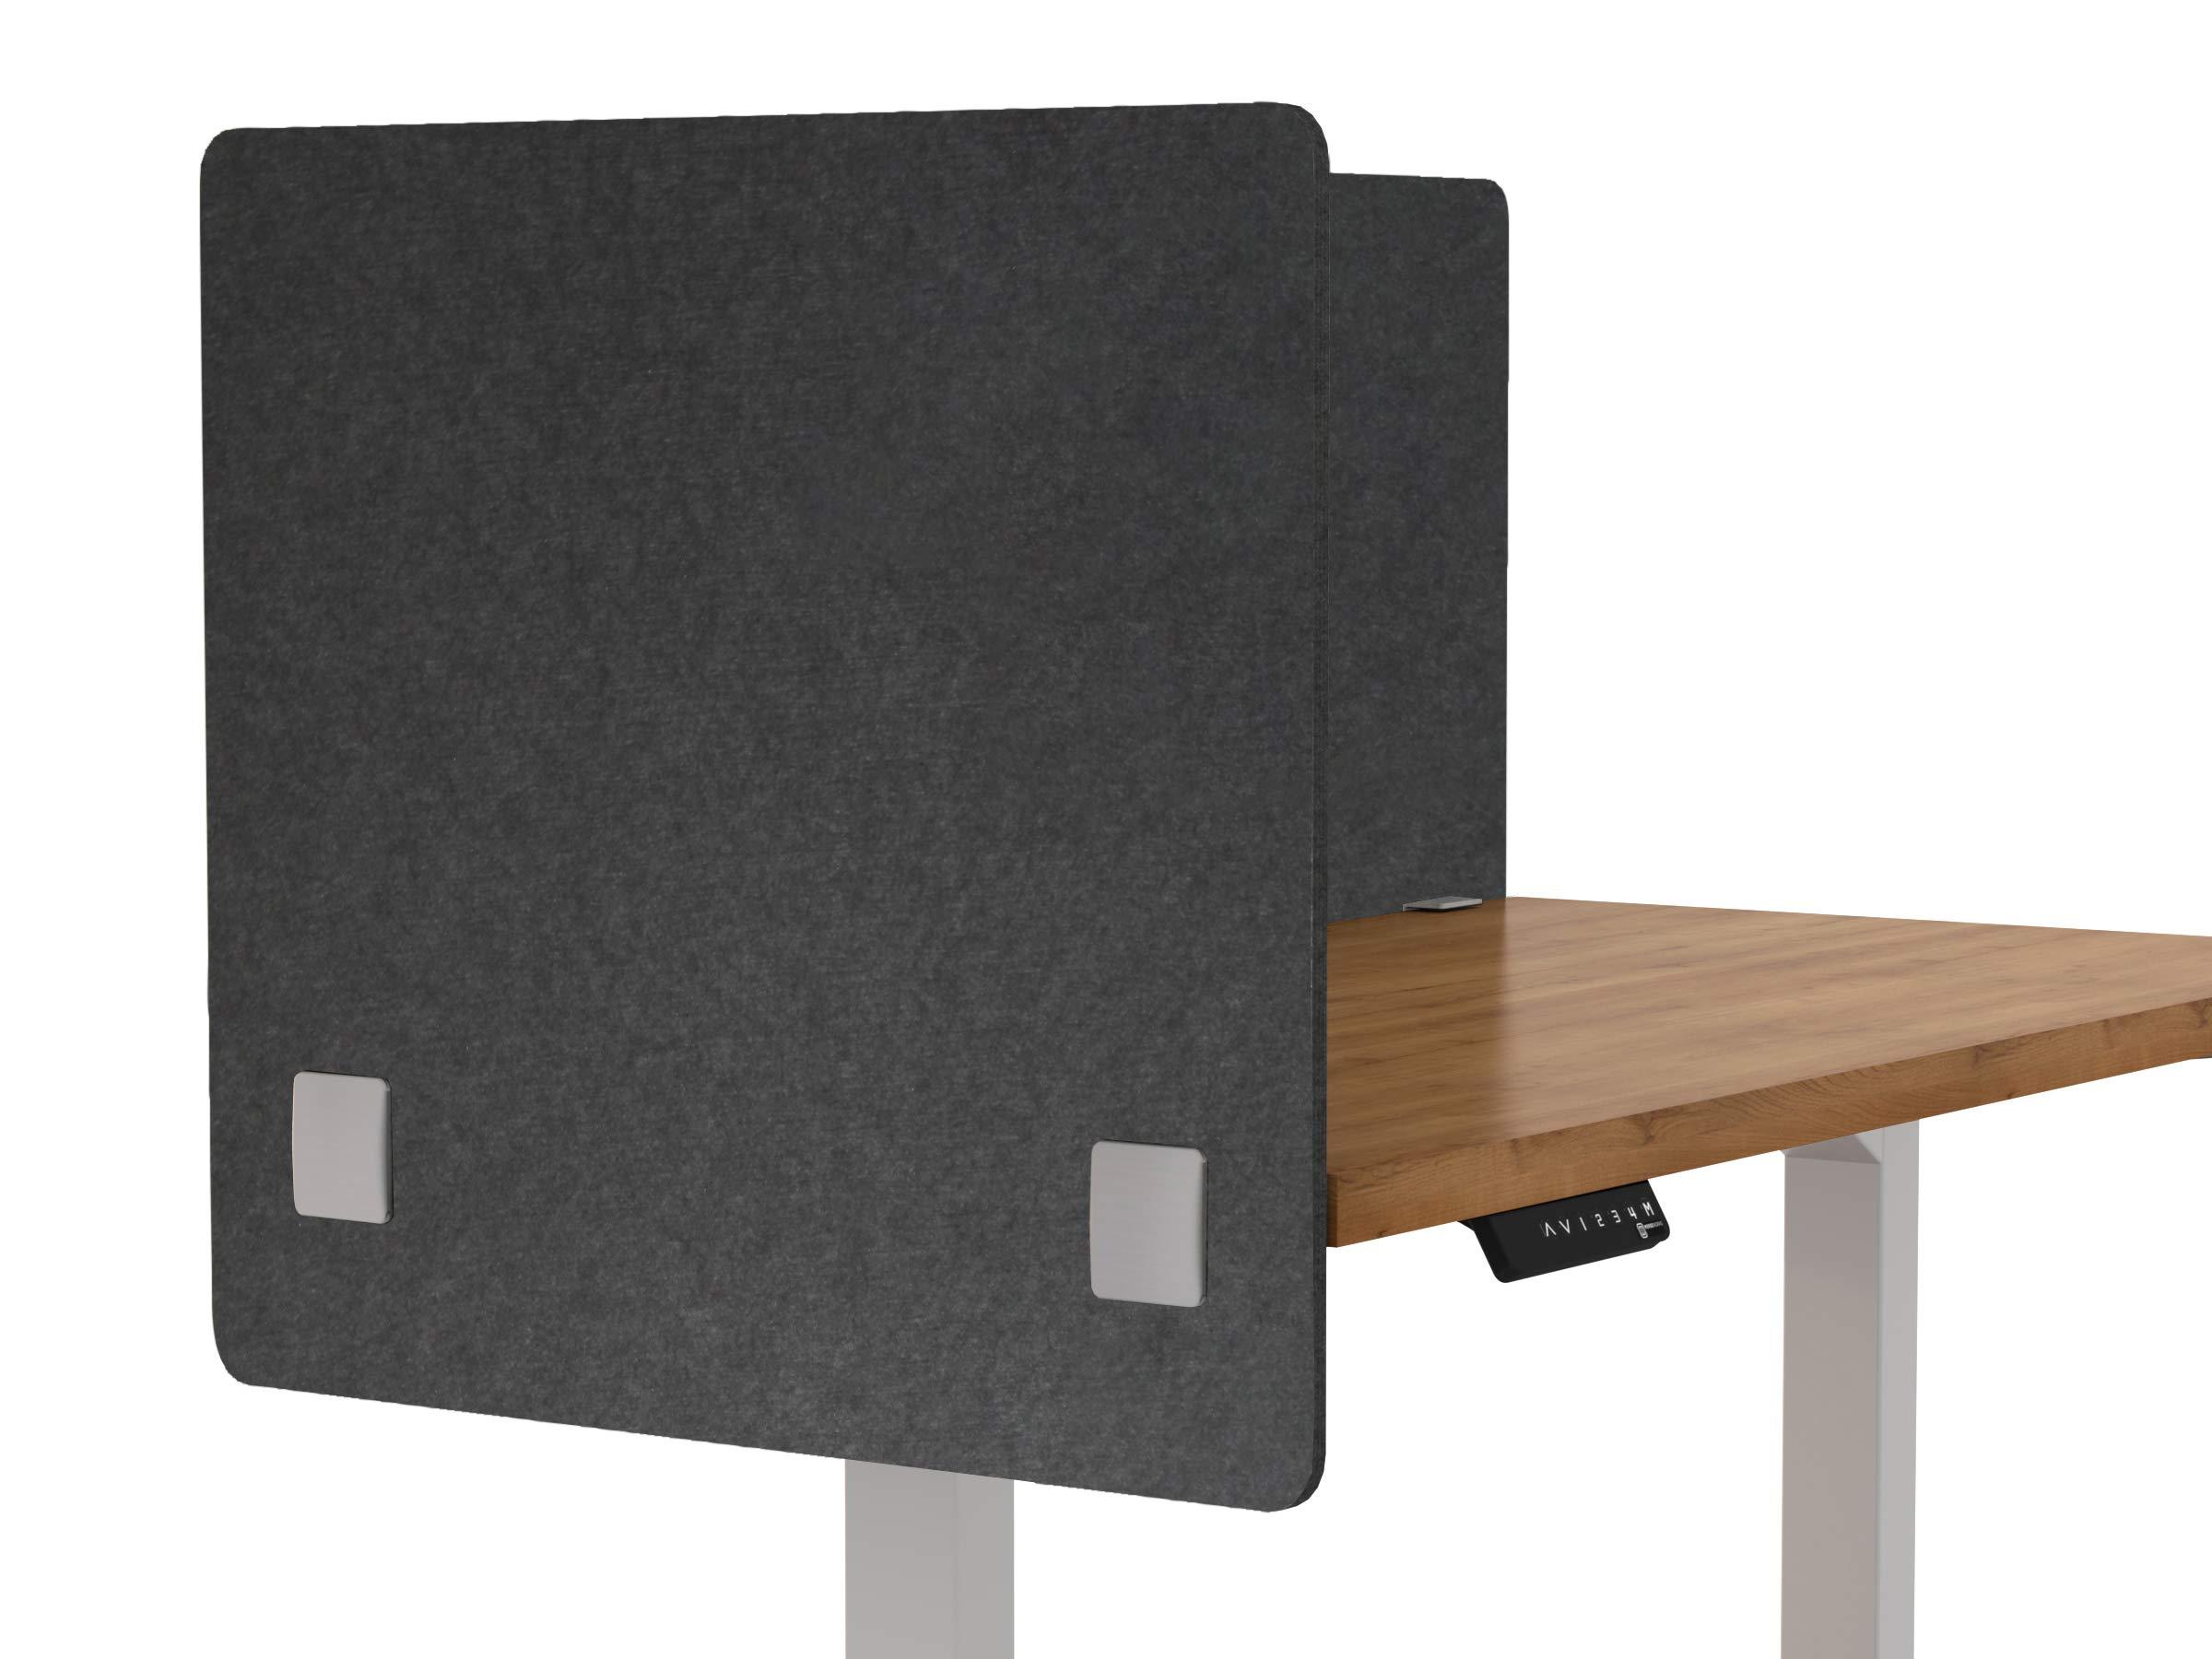 "VaRoom Acoustic Partition, Sound Absorbing Desk Divider – 24"" W x 24""H Privacy Desk Mounted Cubicle Panel, Slate Grey by VaRoom (Image #6)"